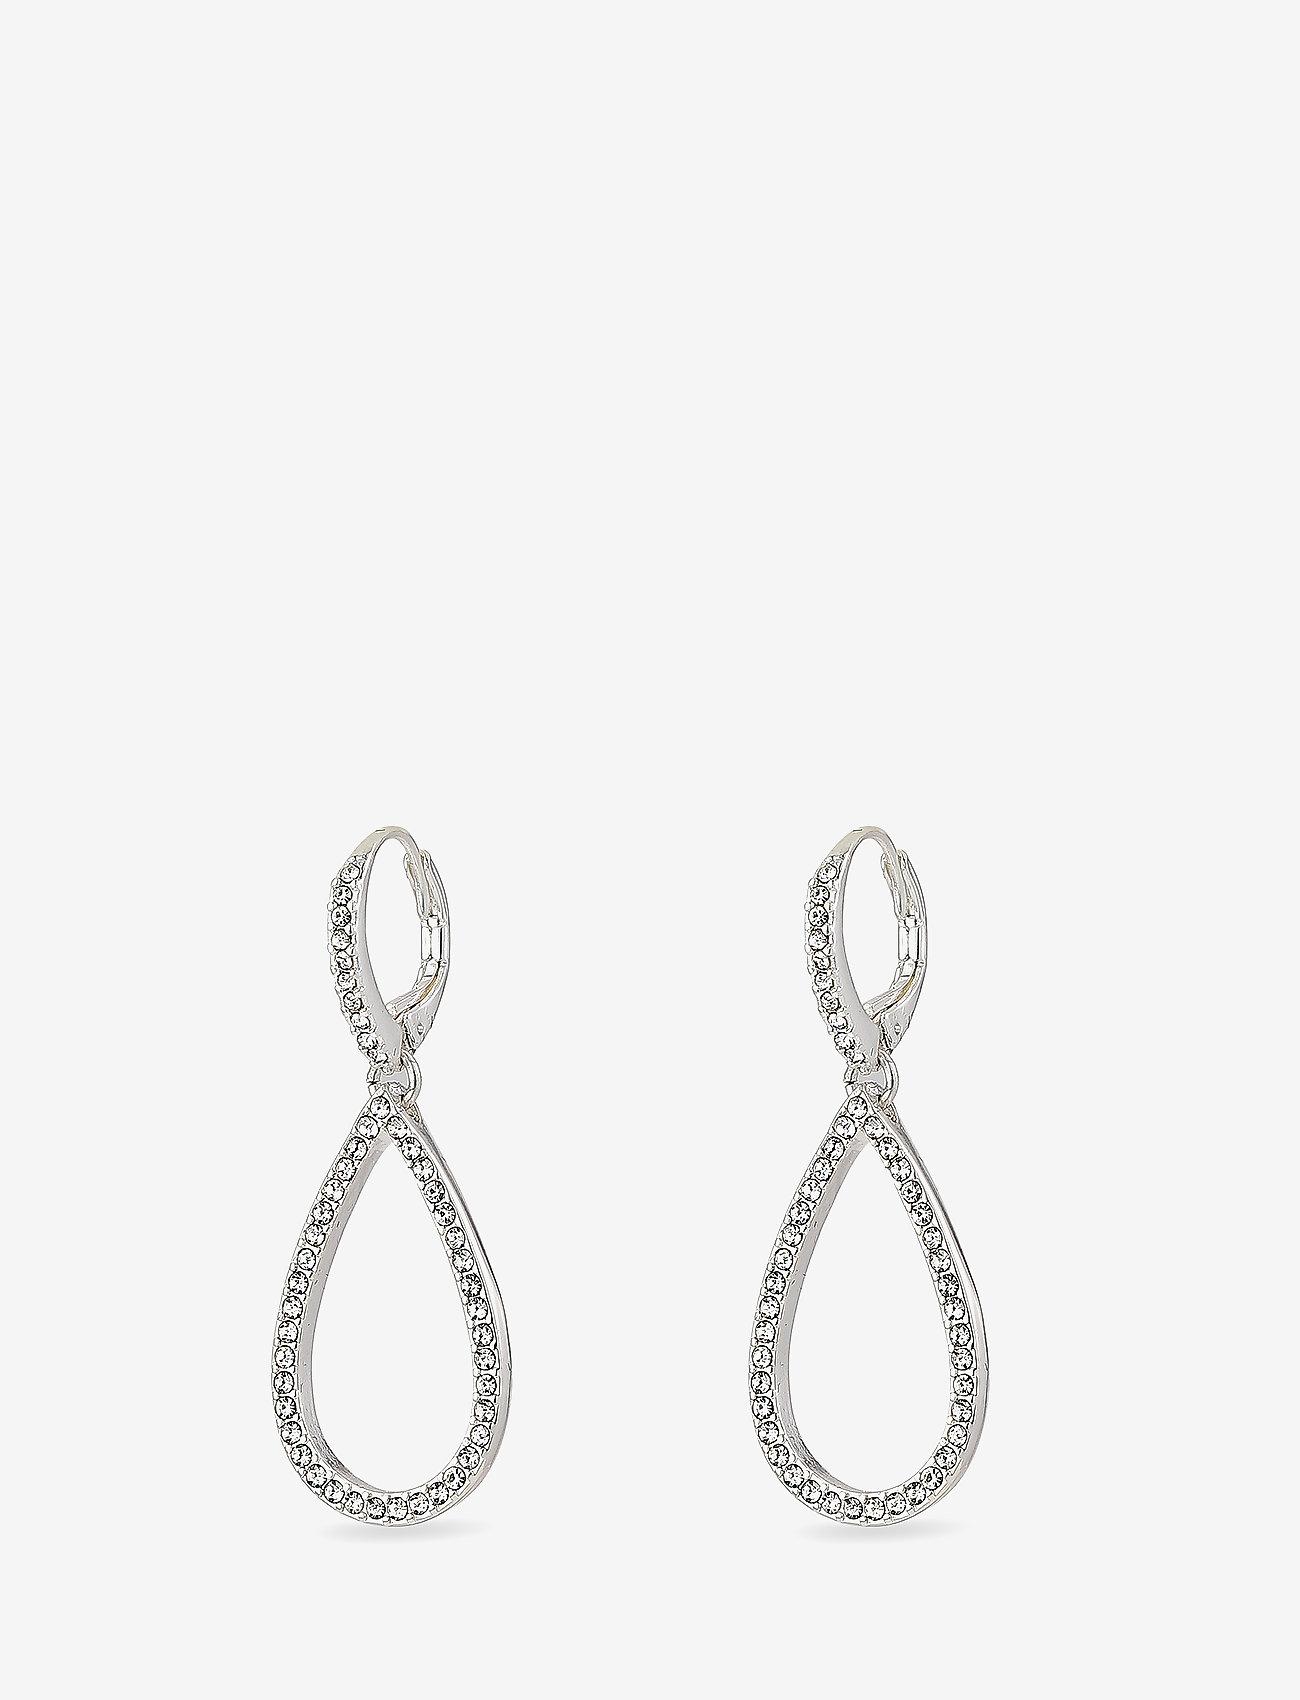 Pilgrim - Delia - pendant - silver plated